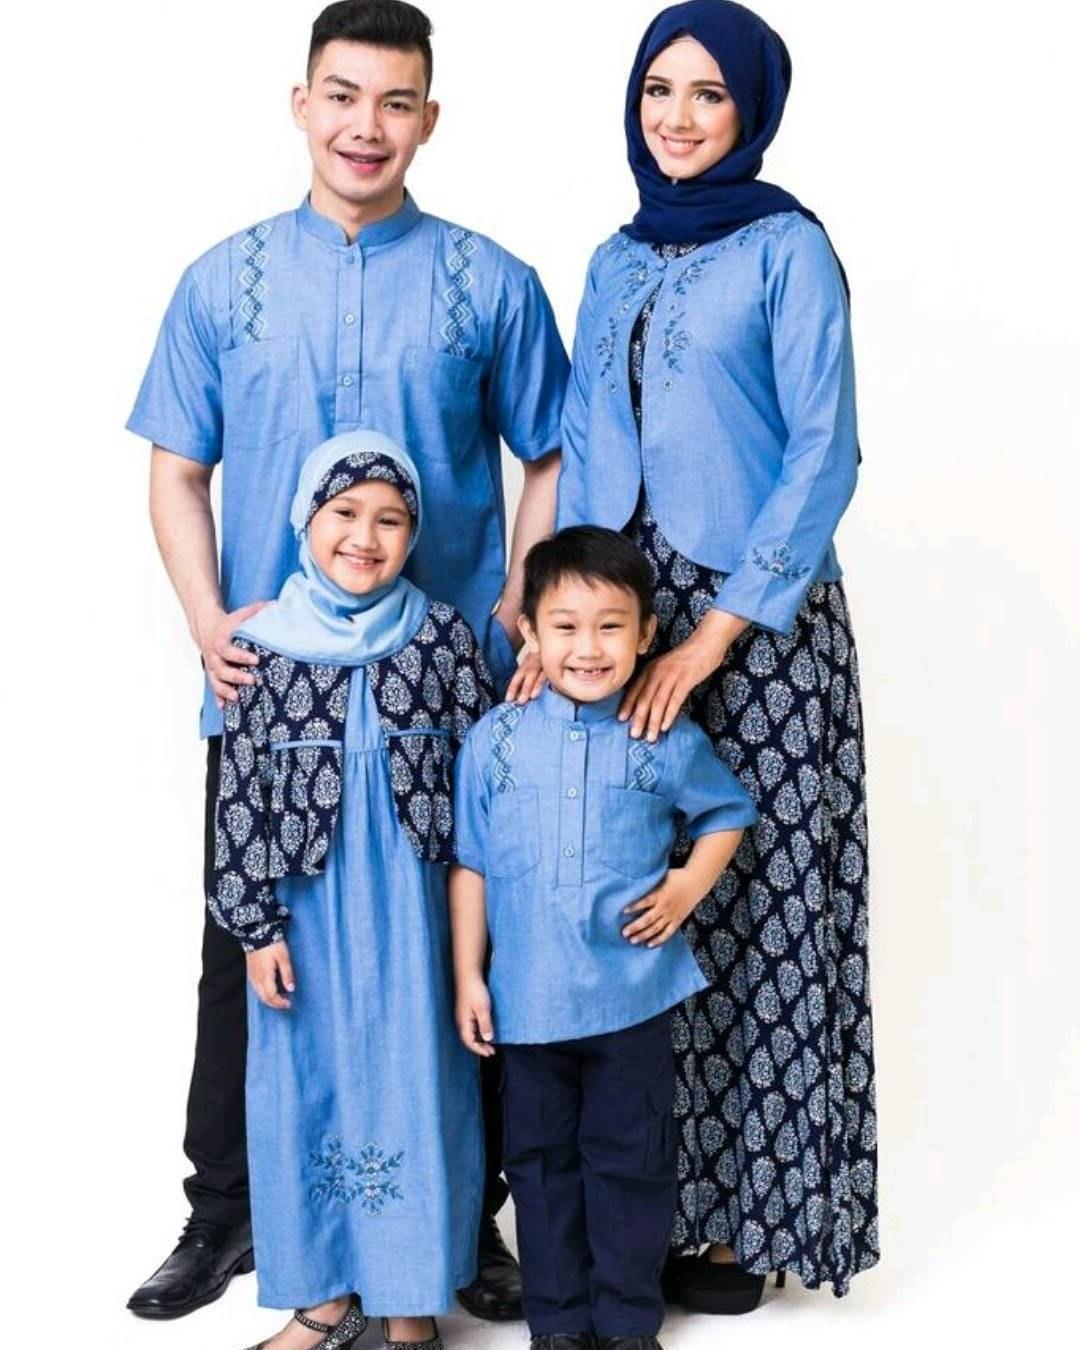 Model Model Baju Lebaran Keluarga Terbaru 2019 S1du Model Baju Keluarga Untuk Hari Raya Lebaran 2018